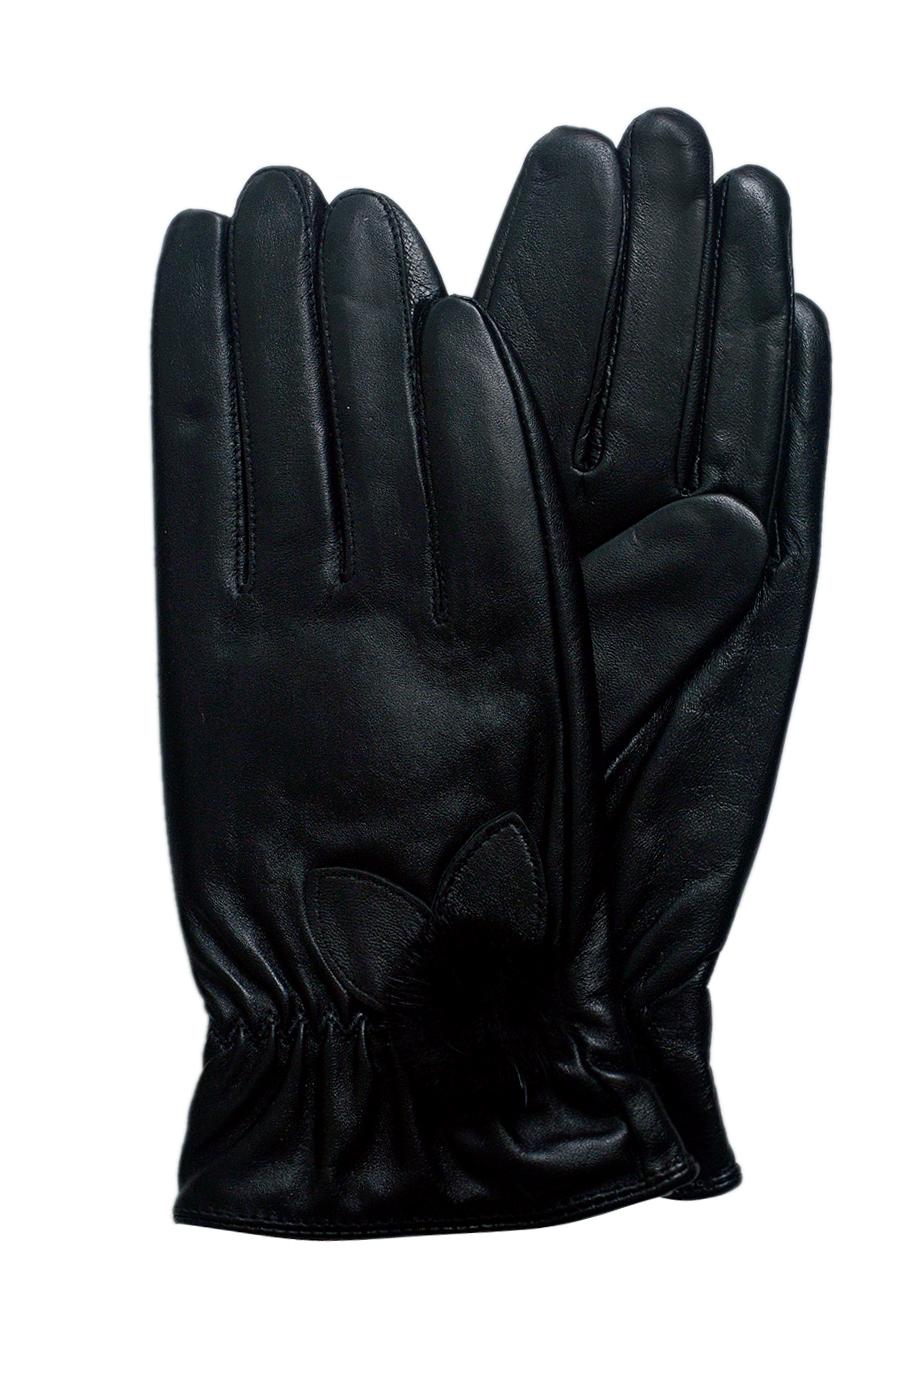 Găng tay nữ ELMI da dê cao cấp EGW134